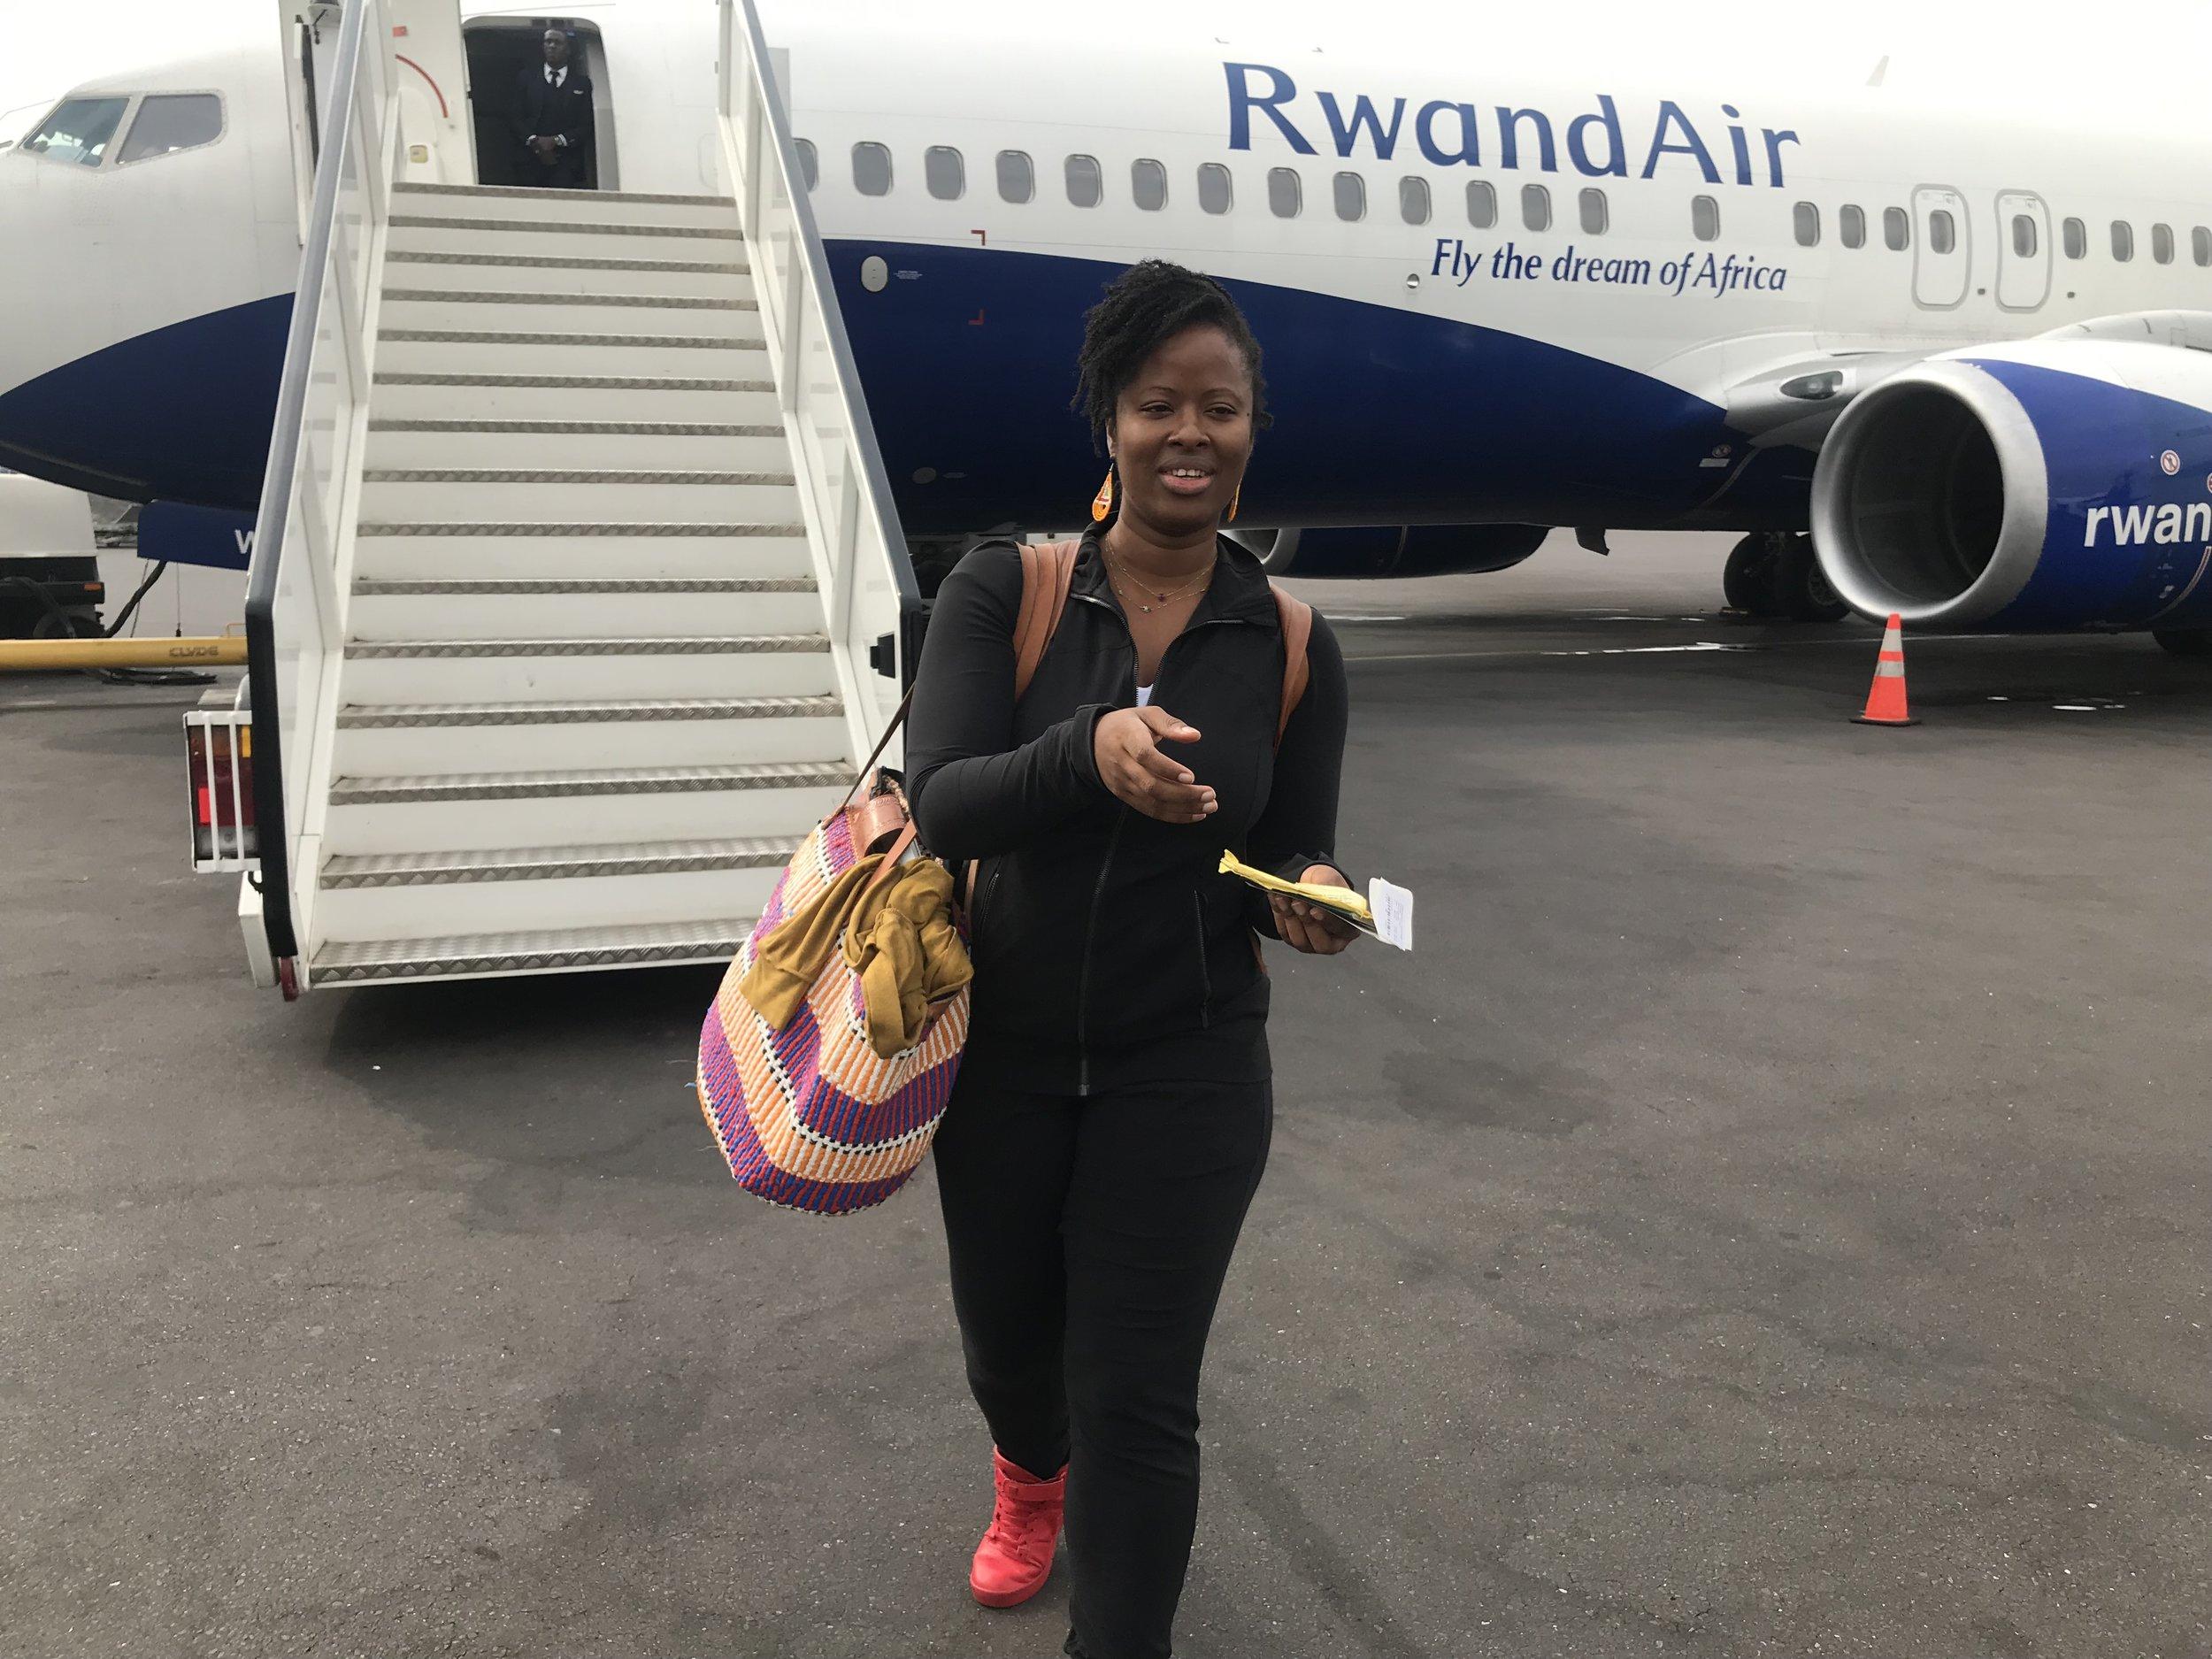 IMG_6271 2VickieRemoe-travel-kigali-rwanda-review-kwibohora25-hotels-africa.JPG